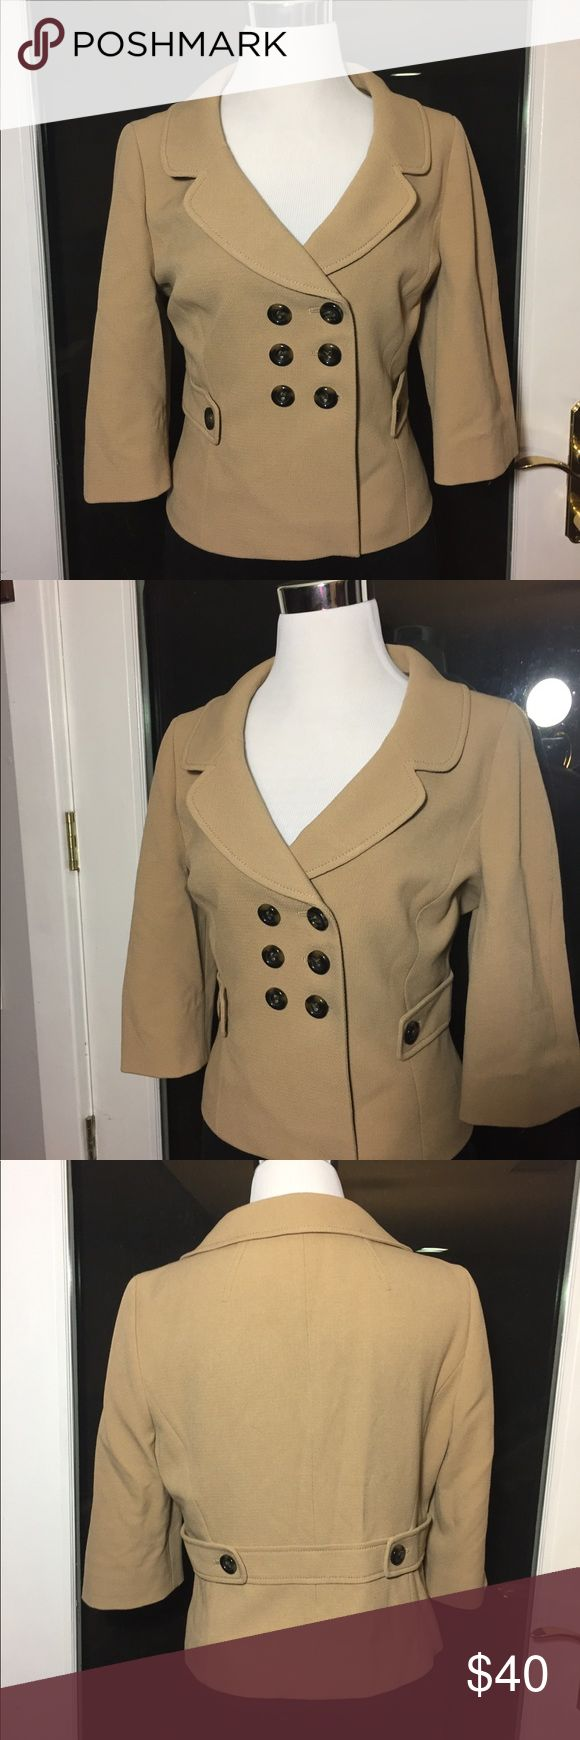 Anne Taylor loft blazer Anne Taylor Loft blazer smart, trim design anne taylor loft Jackets & Coats Blazers